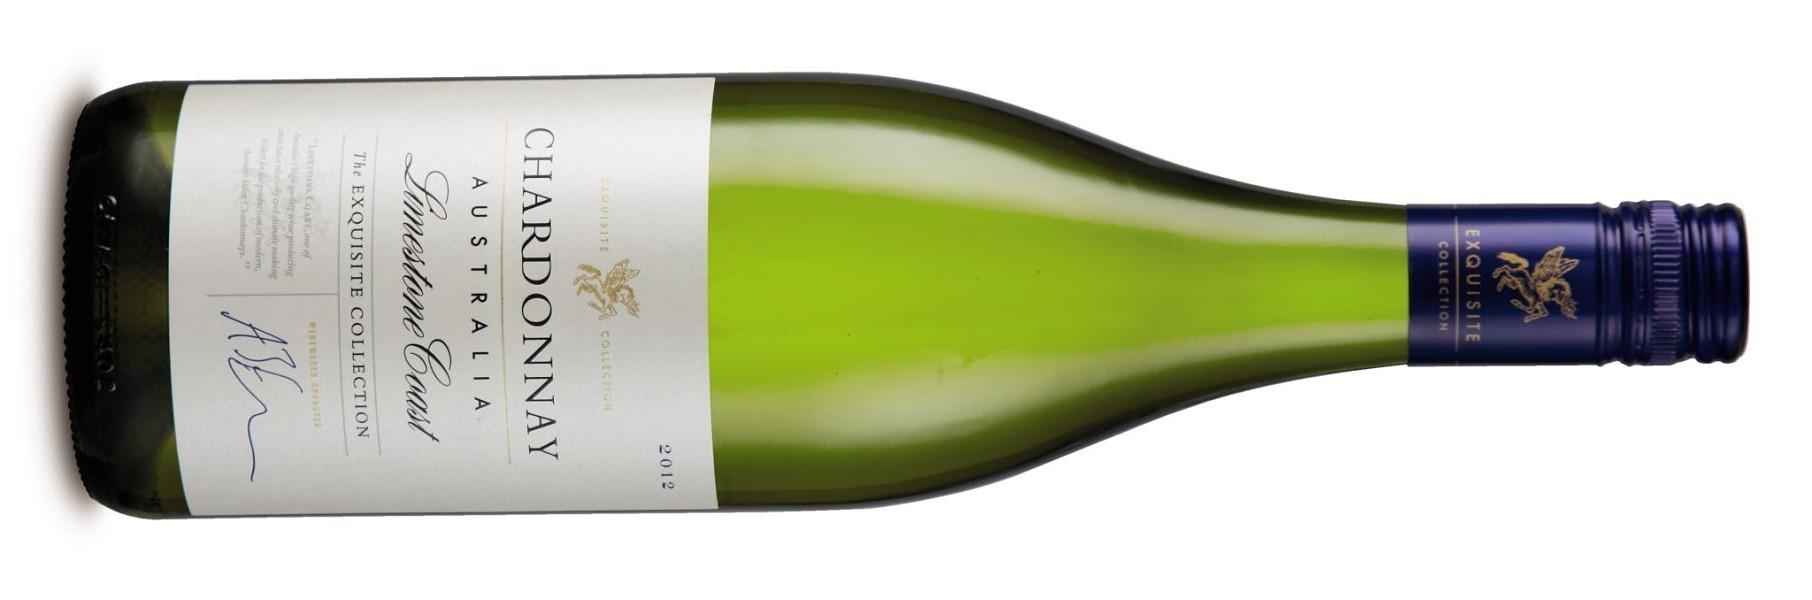 Aldi Exquisite Collection Limestone Coast Chardonnay